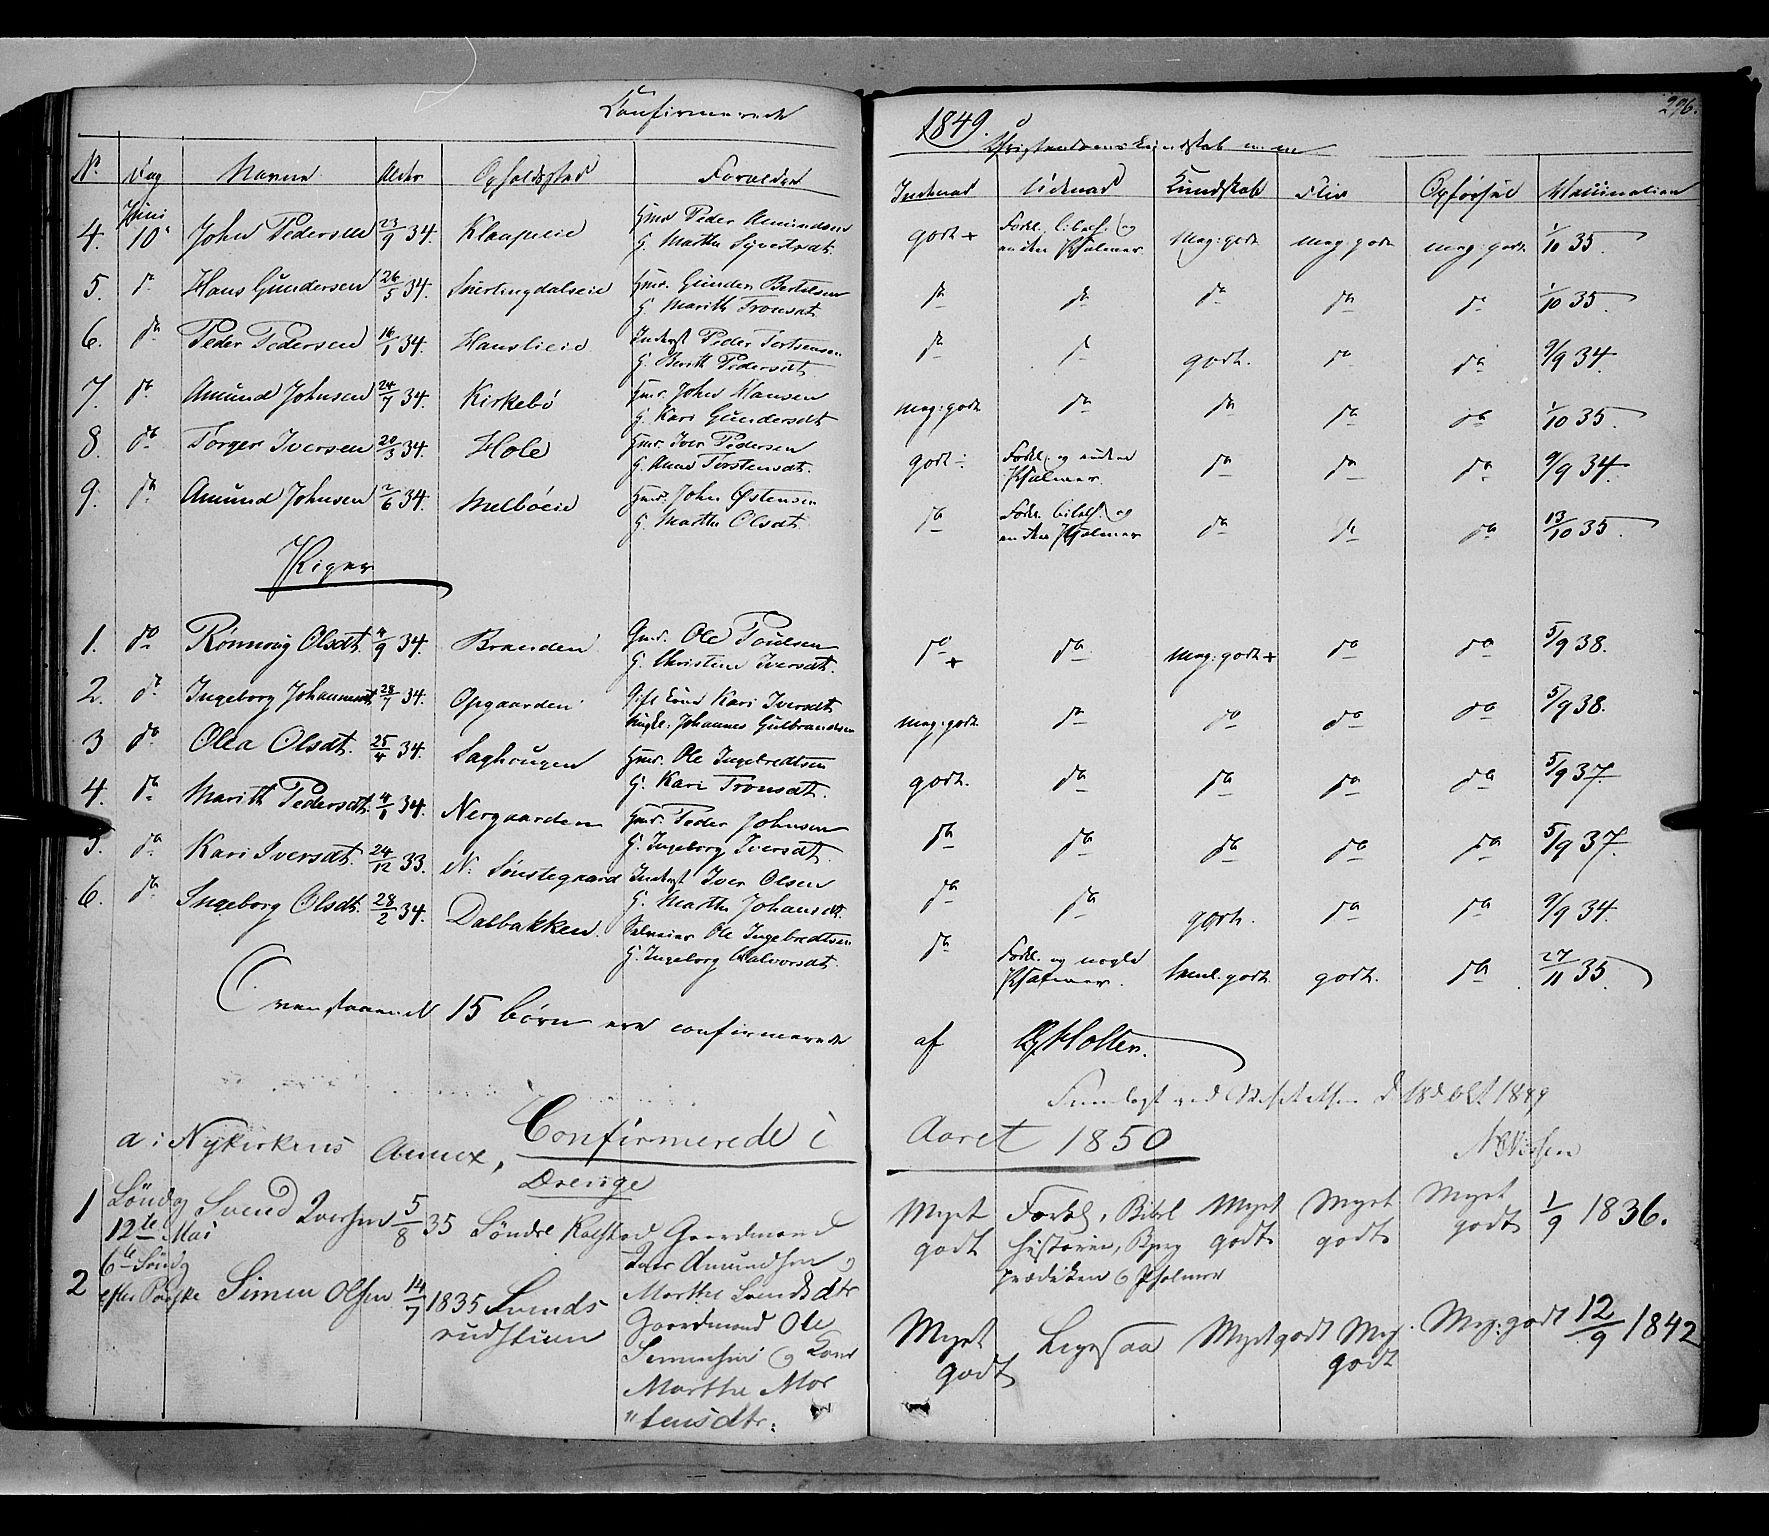 SAH, Gausdal prestekontor, Ministerialbok nr. 7, 1840-1850, s. 296